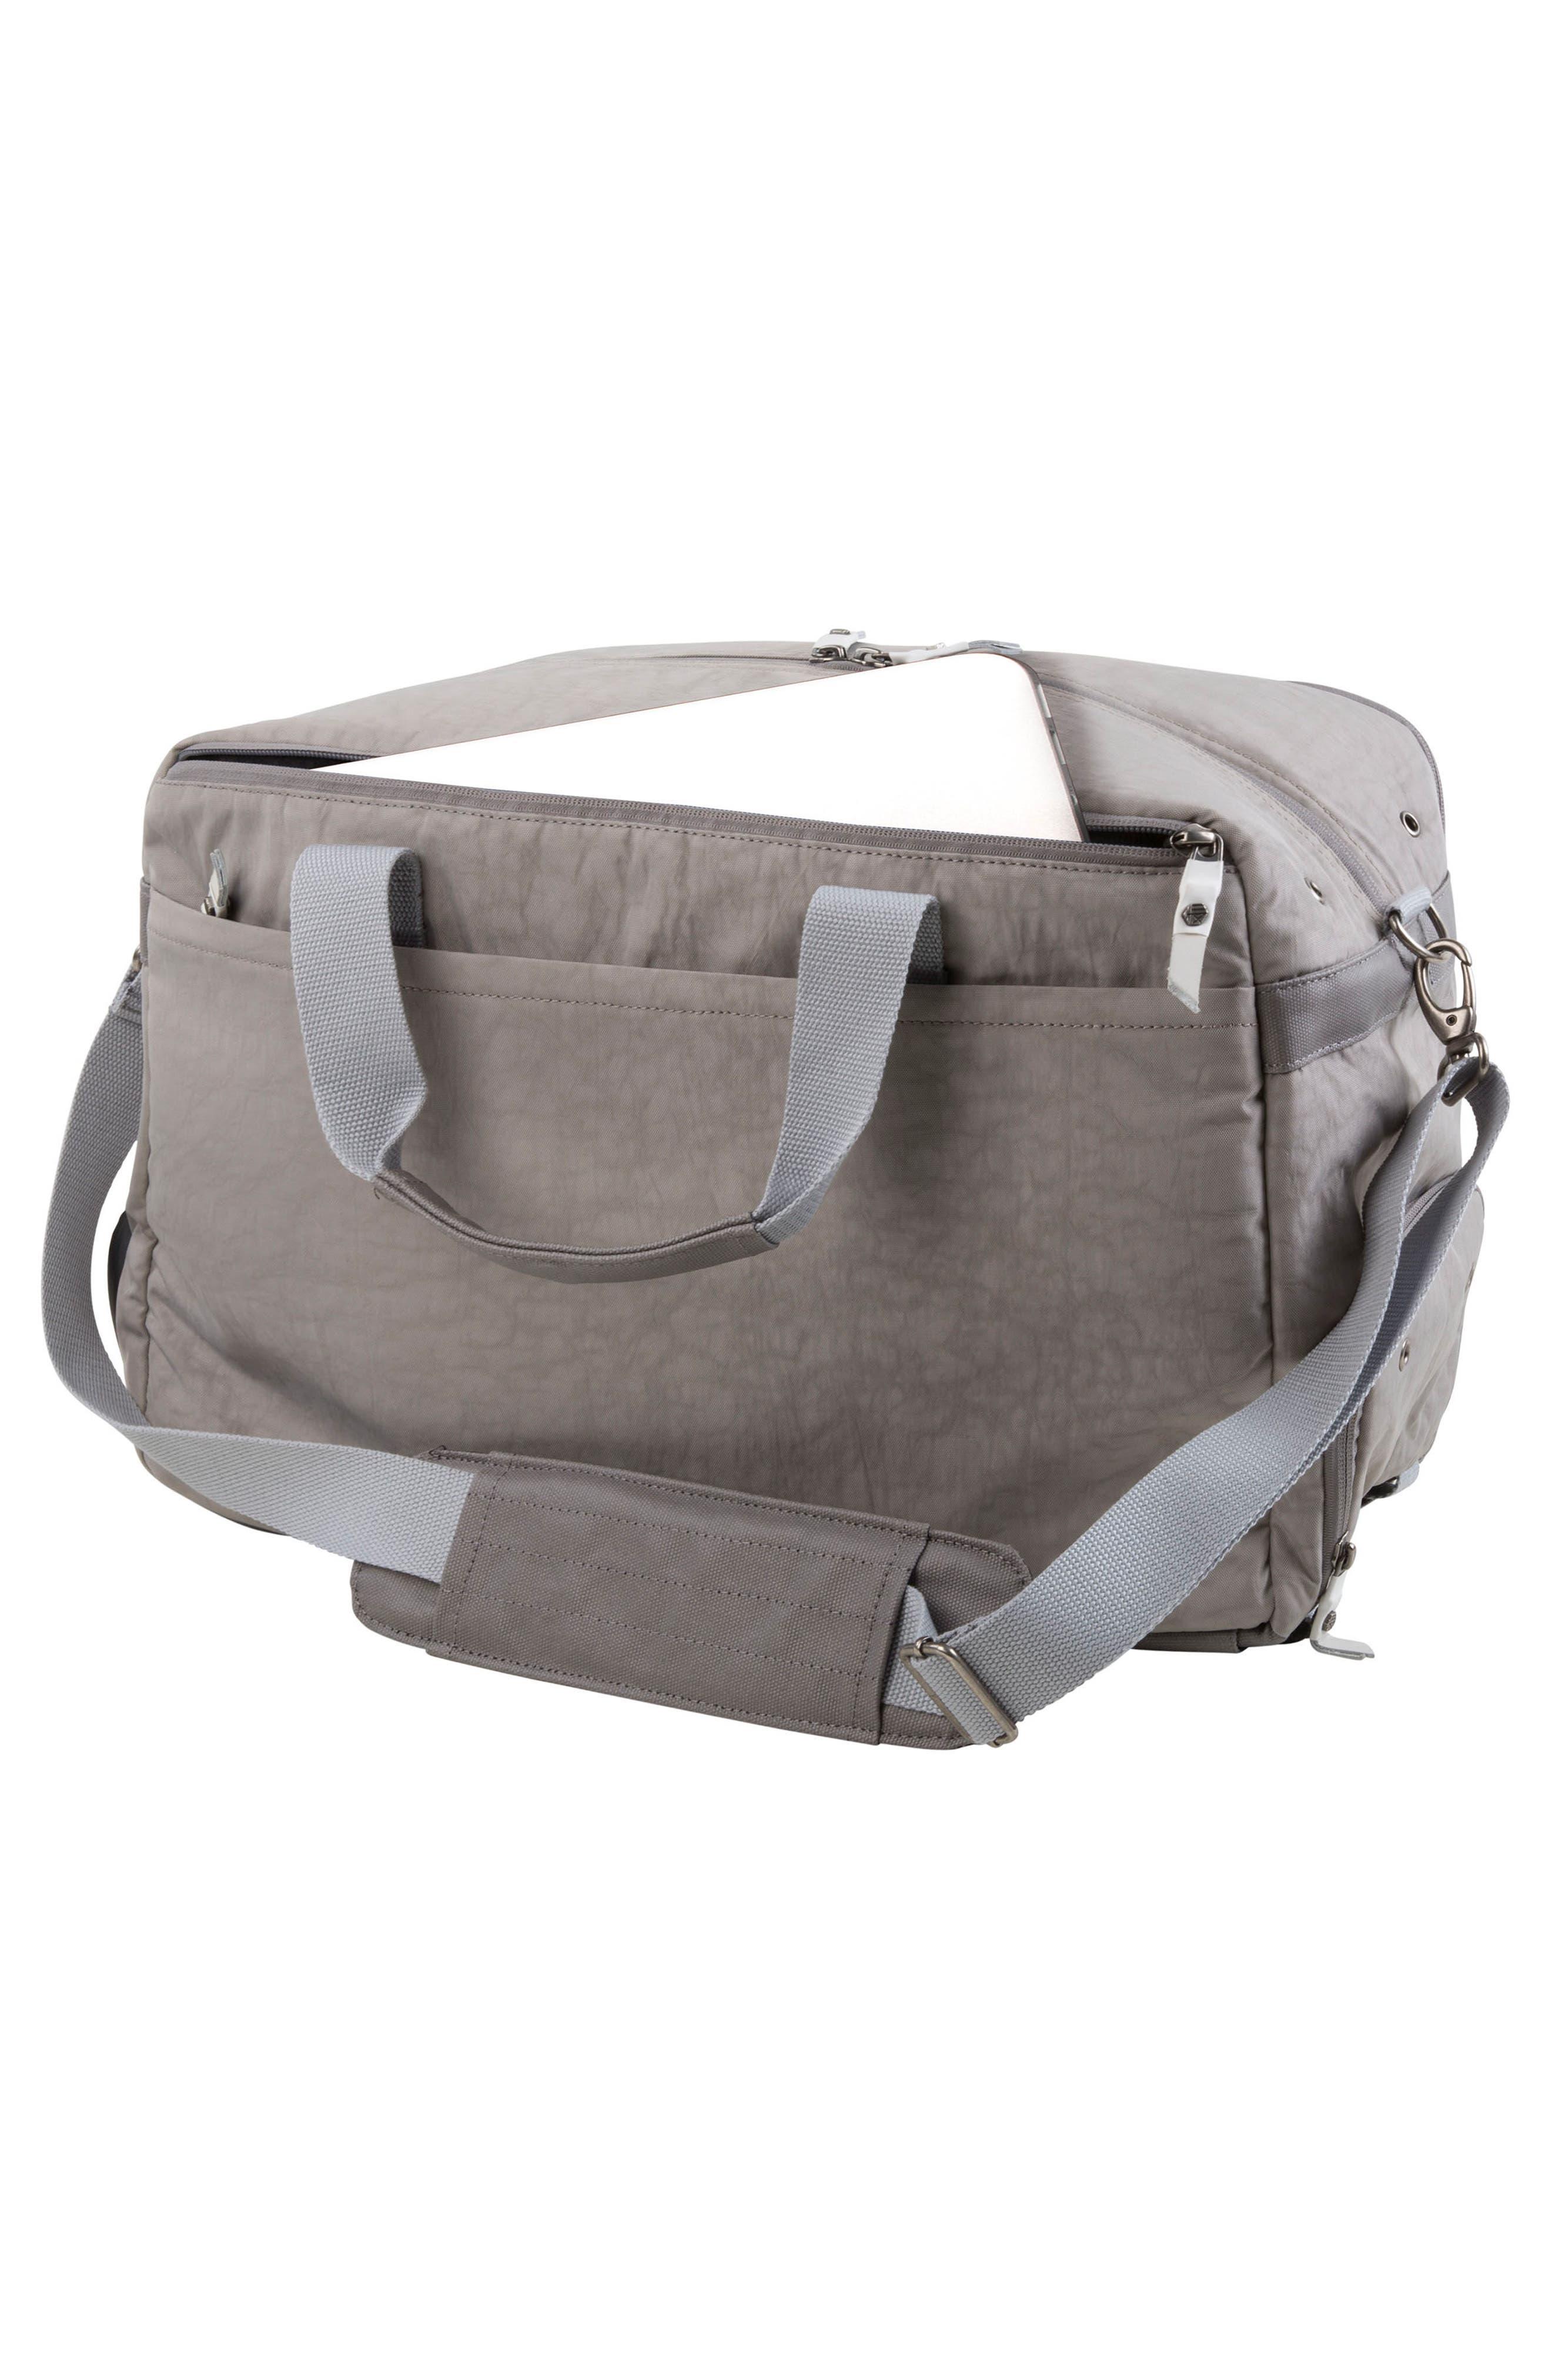 Calibre Convertible Duffel Bag,                             Alternate thumbnail 2, color,                             Strata Grey